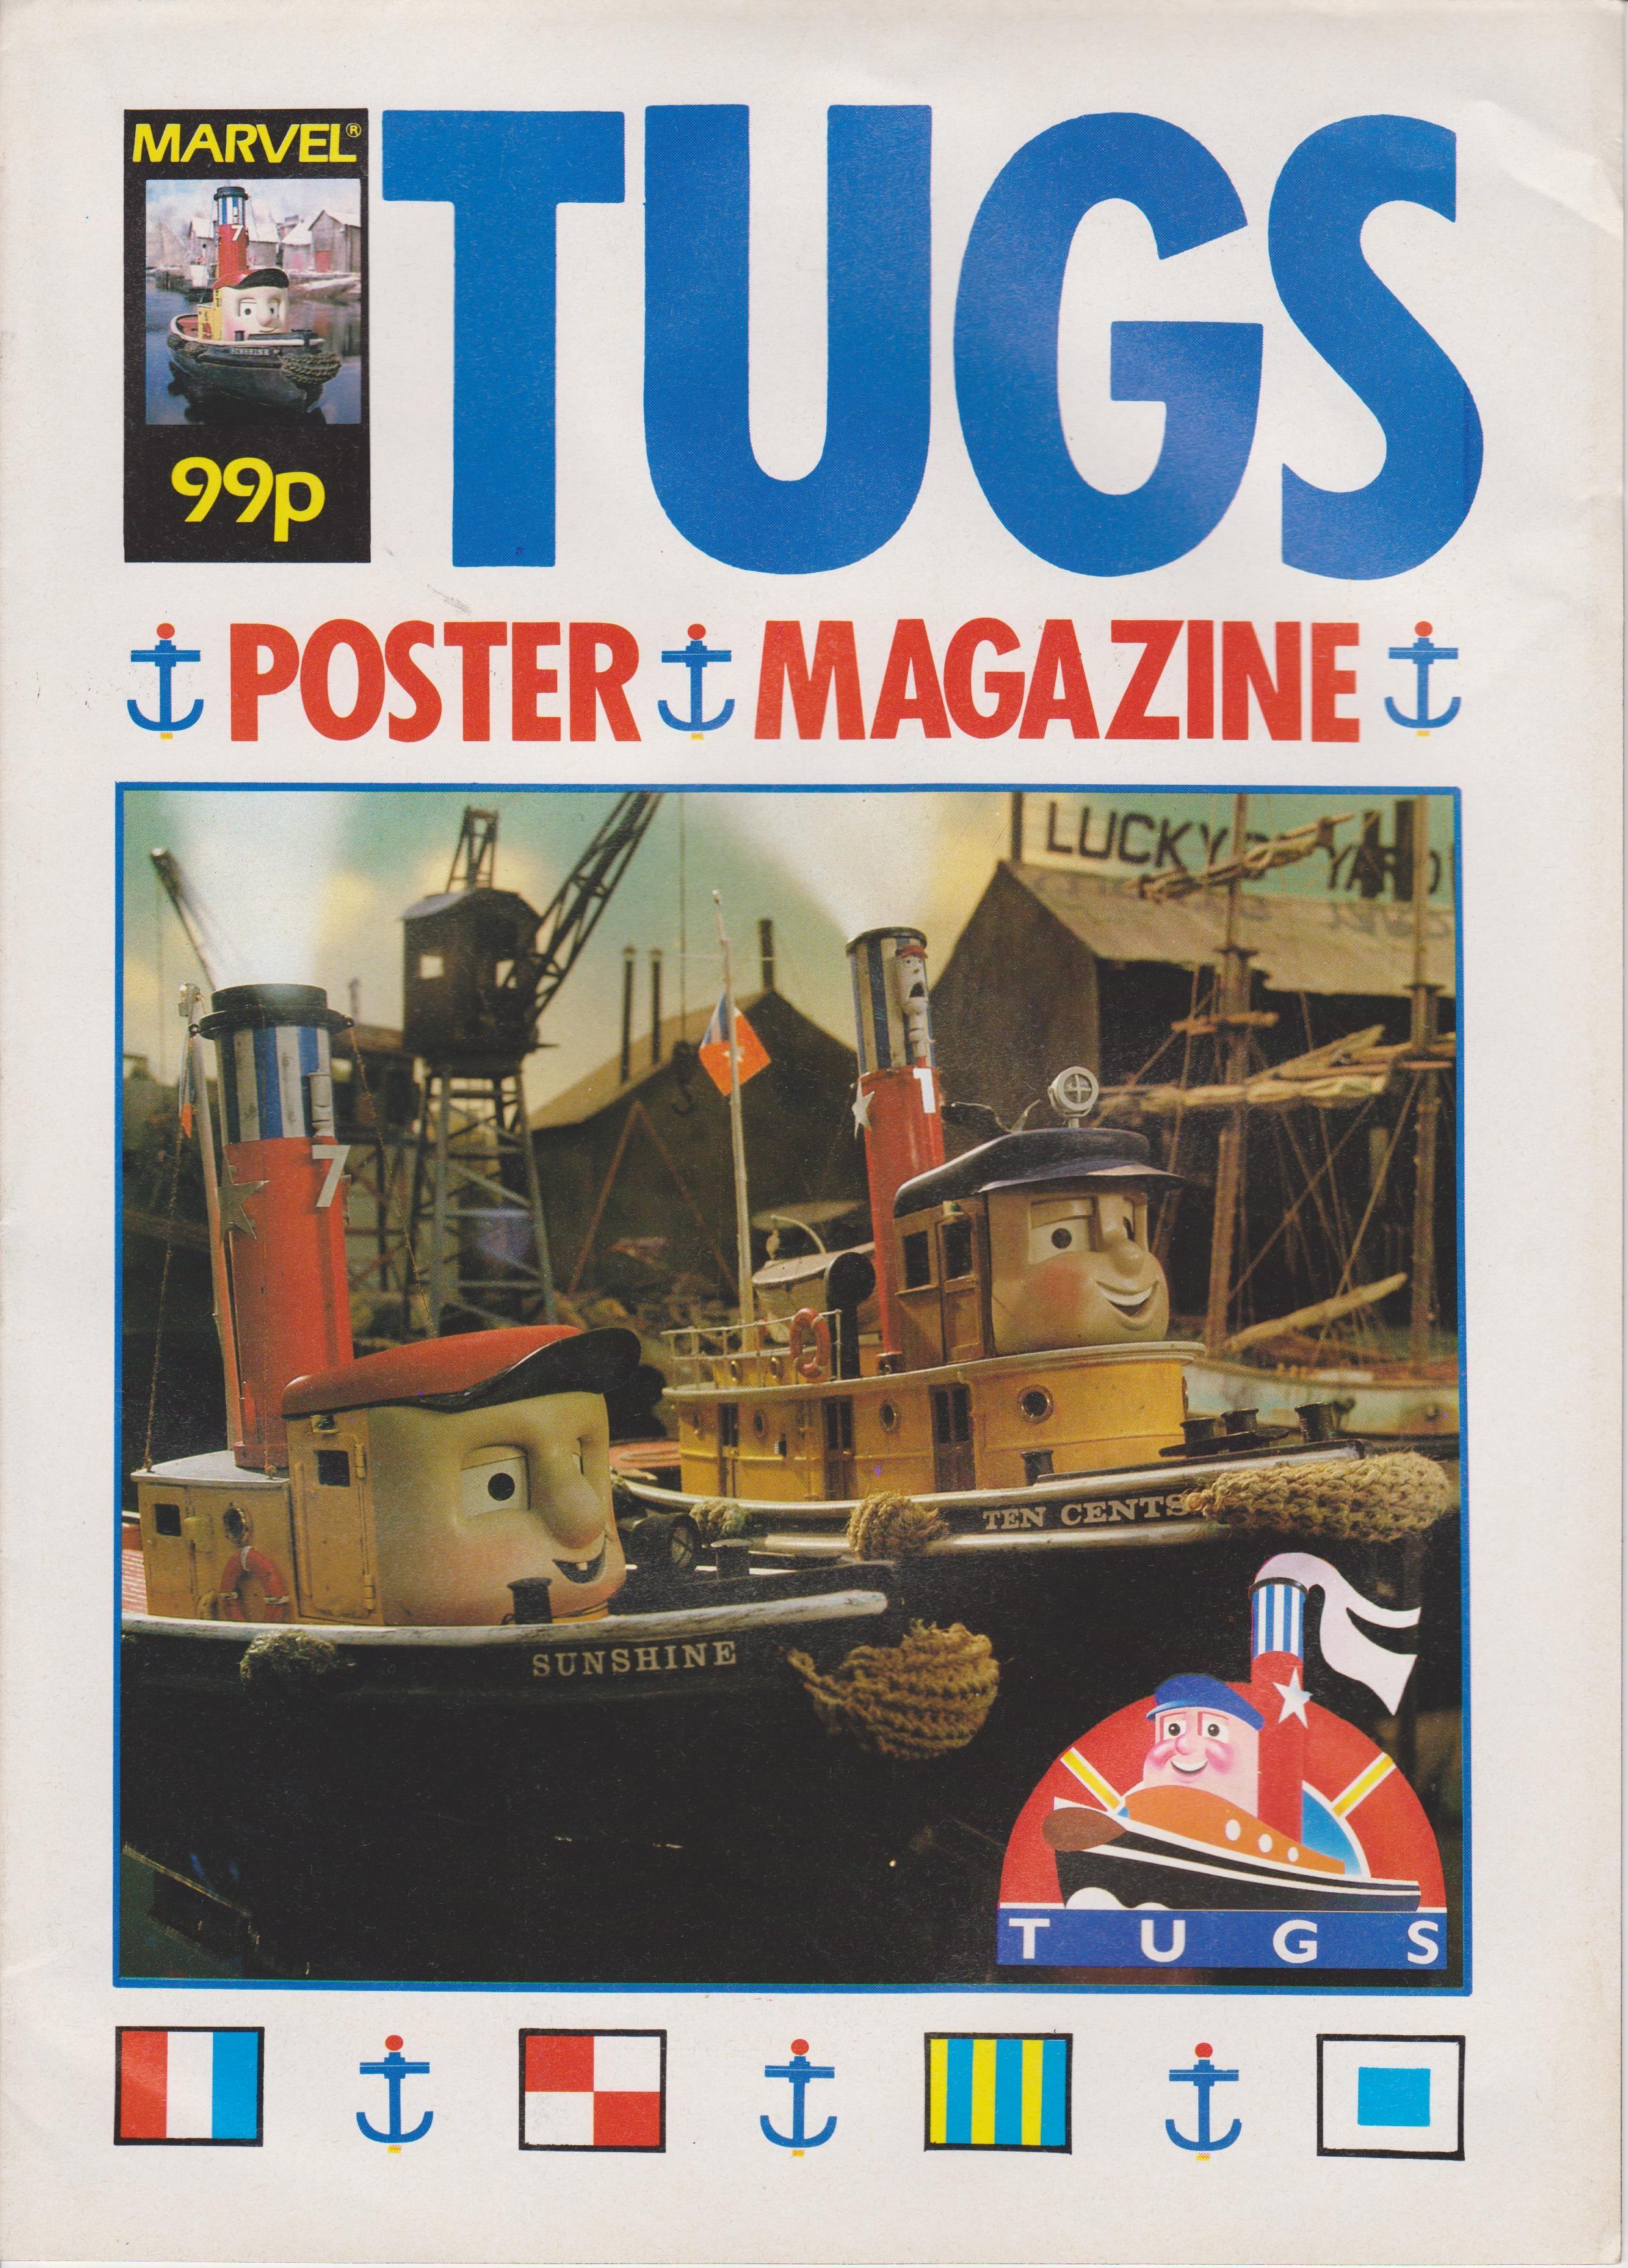 TUGS Poster Magazine Vol 1